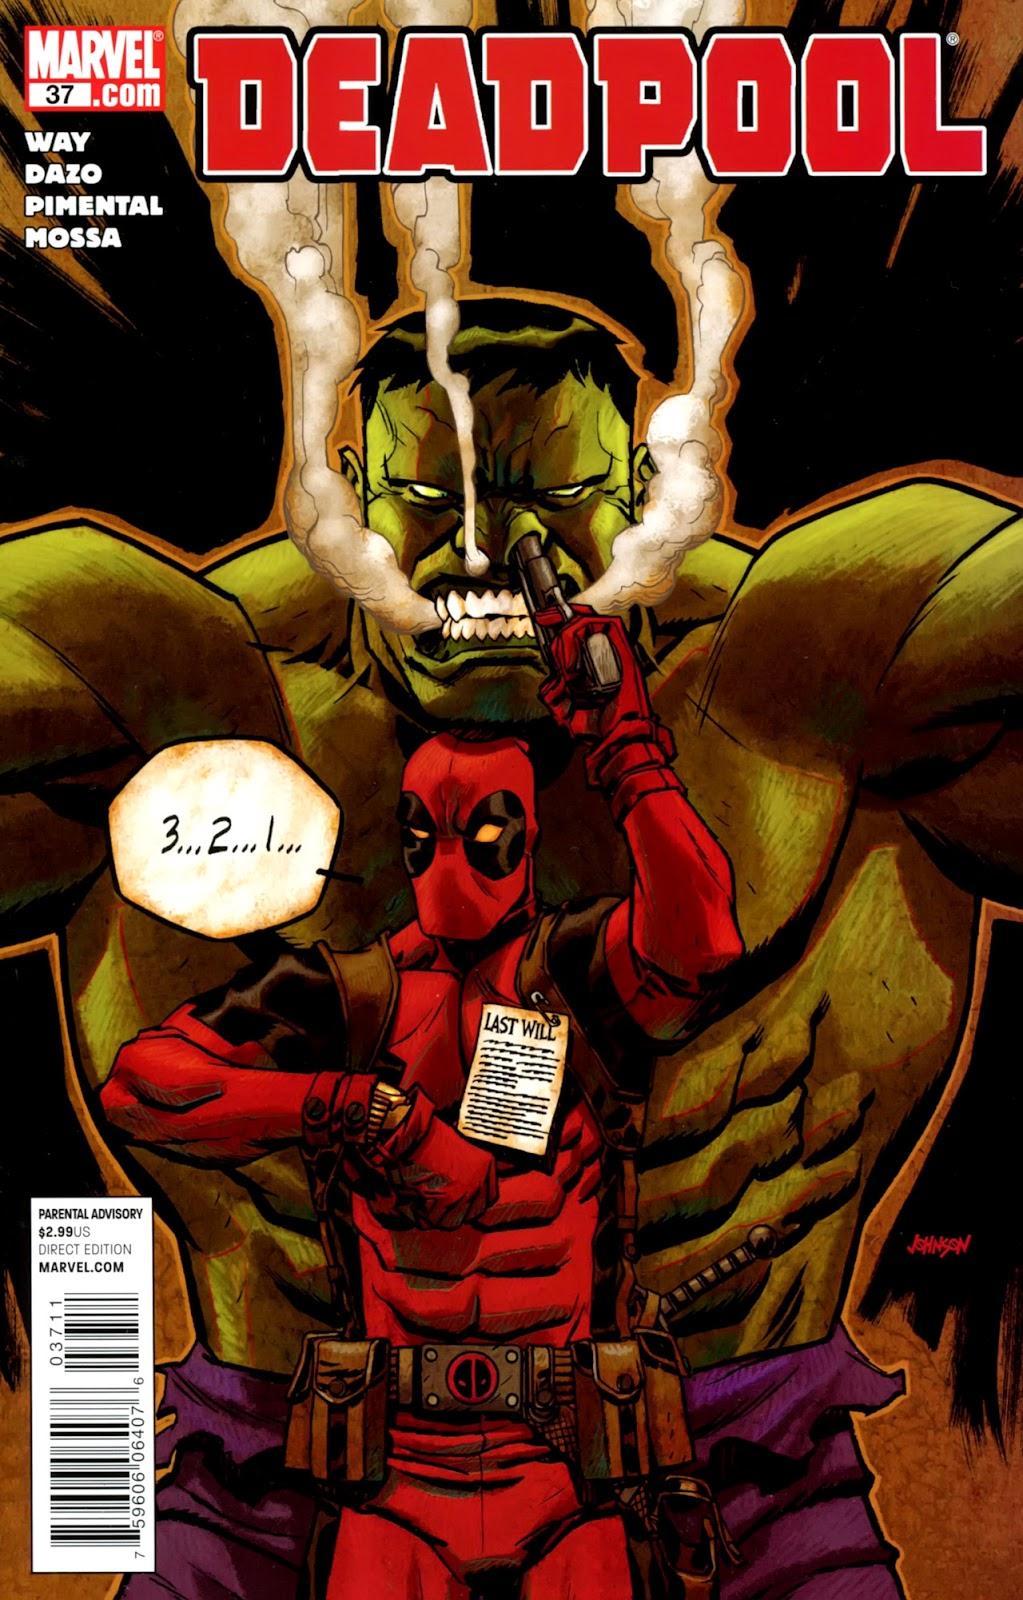 Read online Deadpool (2008) comic -  Issue #37 - 1